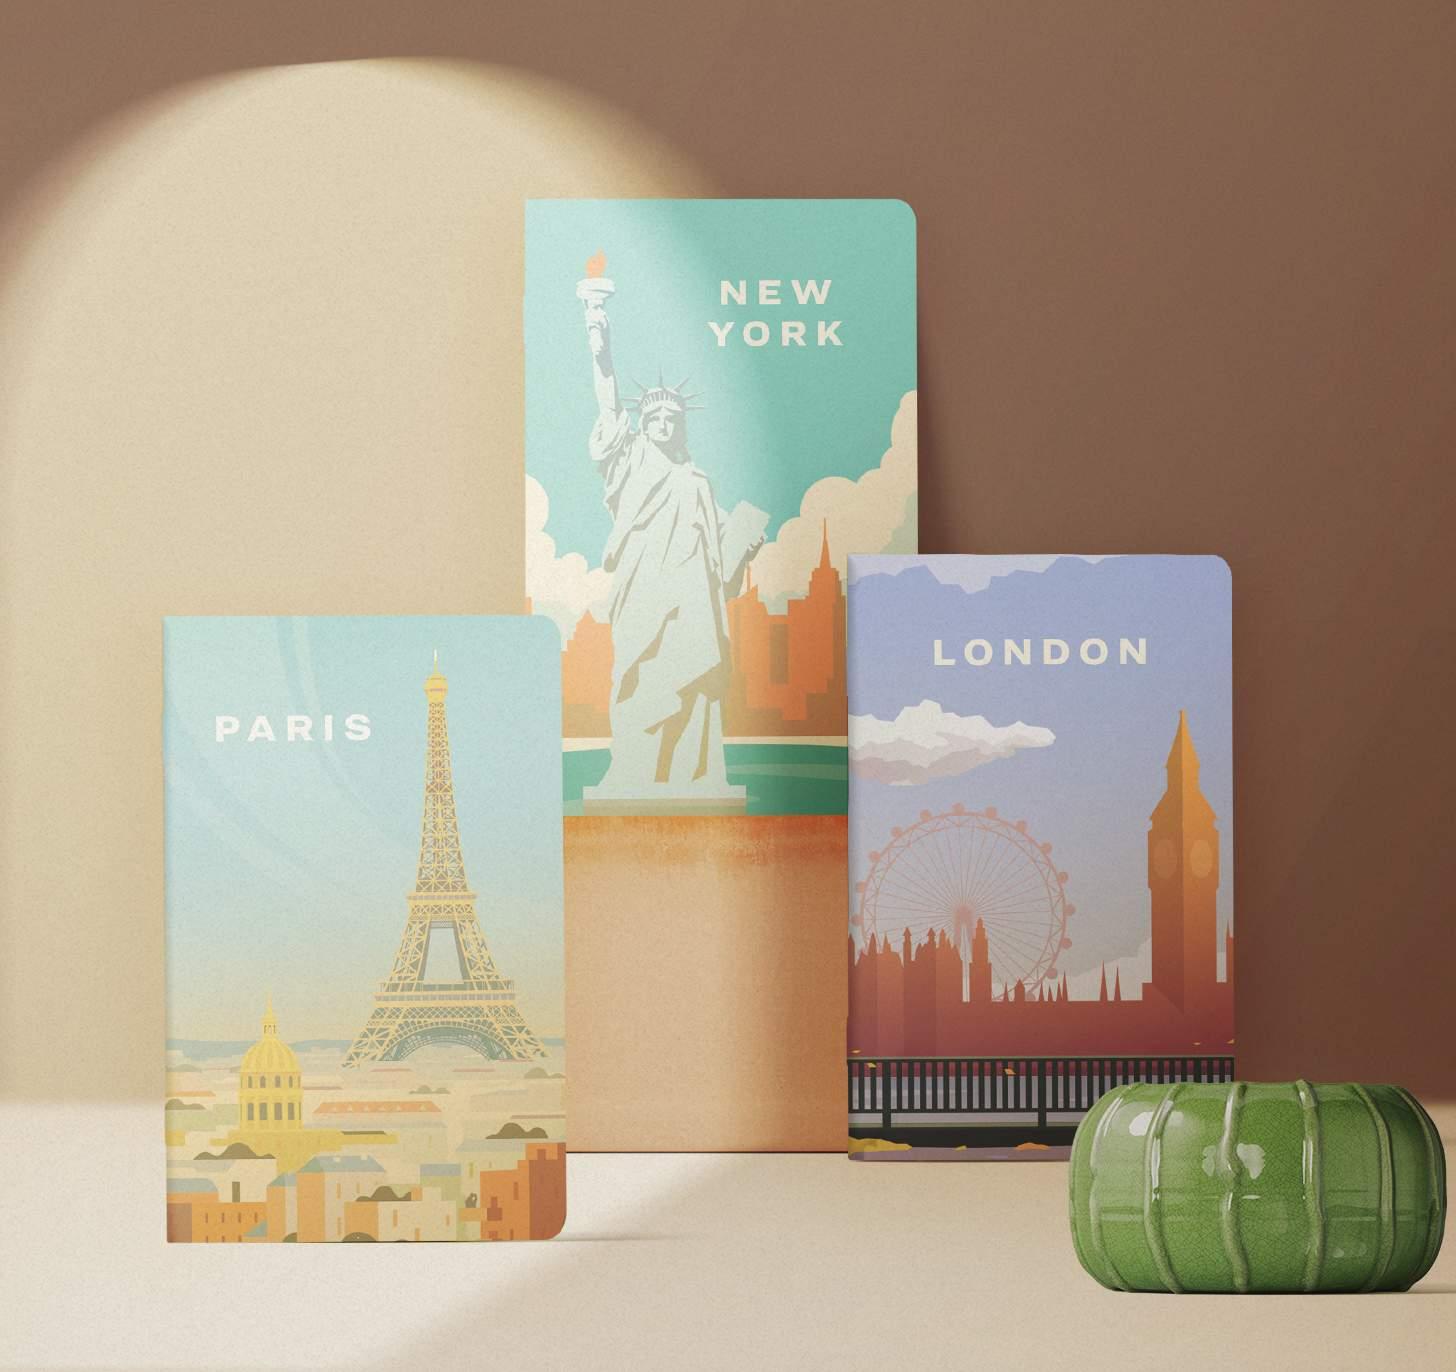 New York, Paris, London themed notebooks